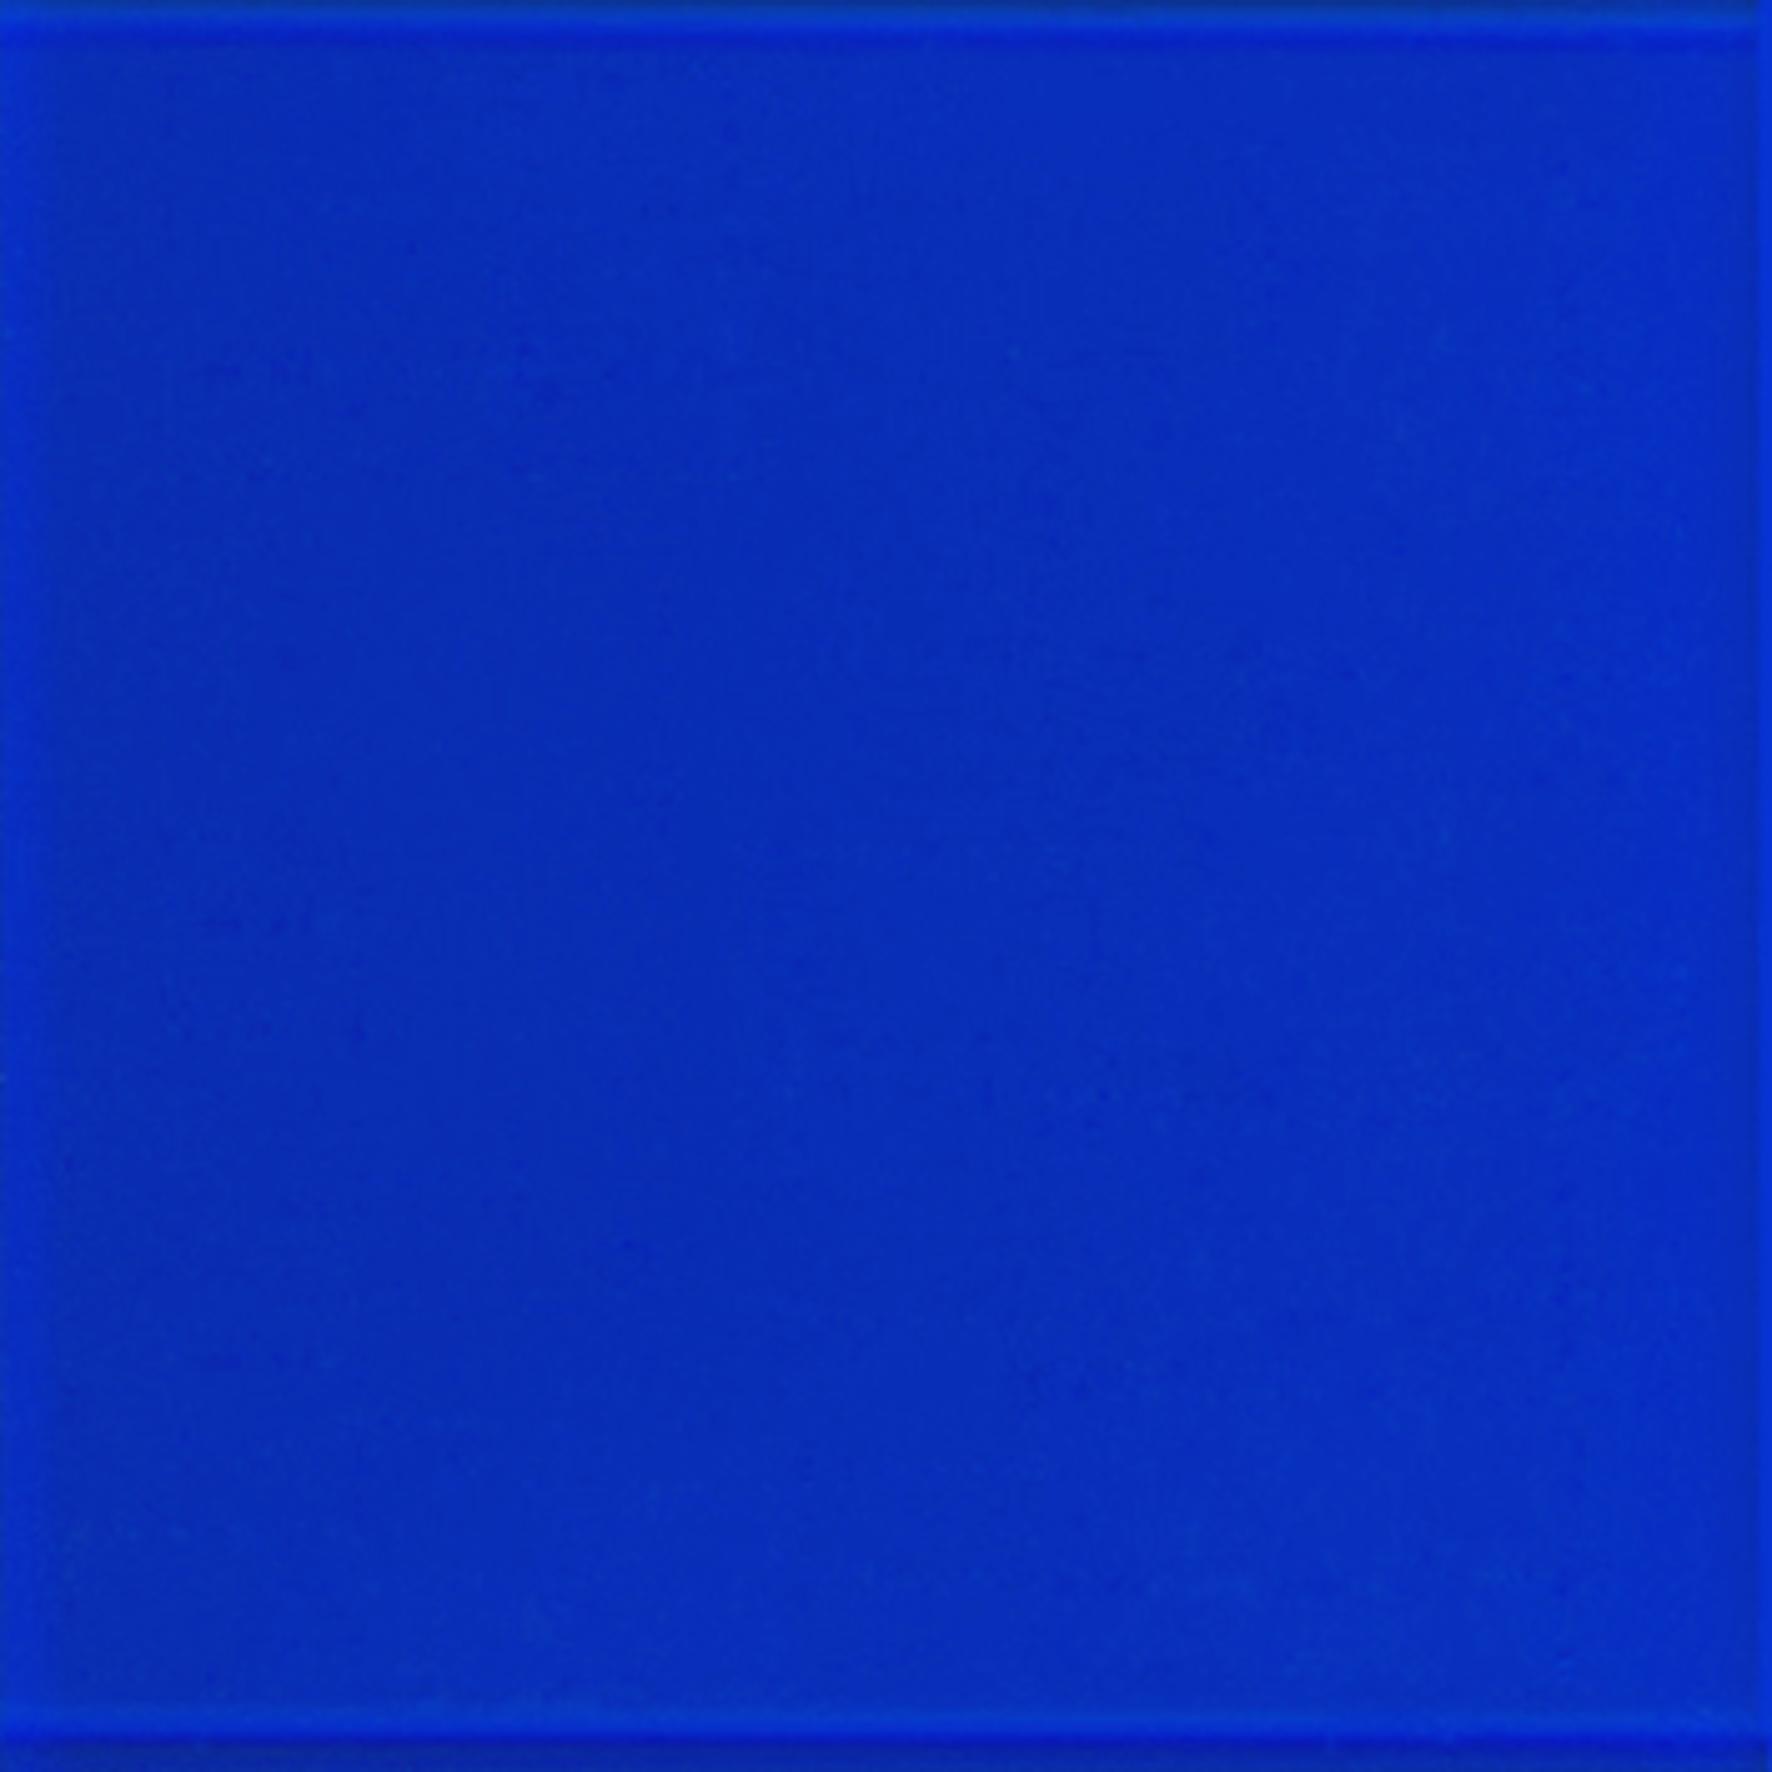 Chelsea Blue pic 97